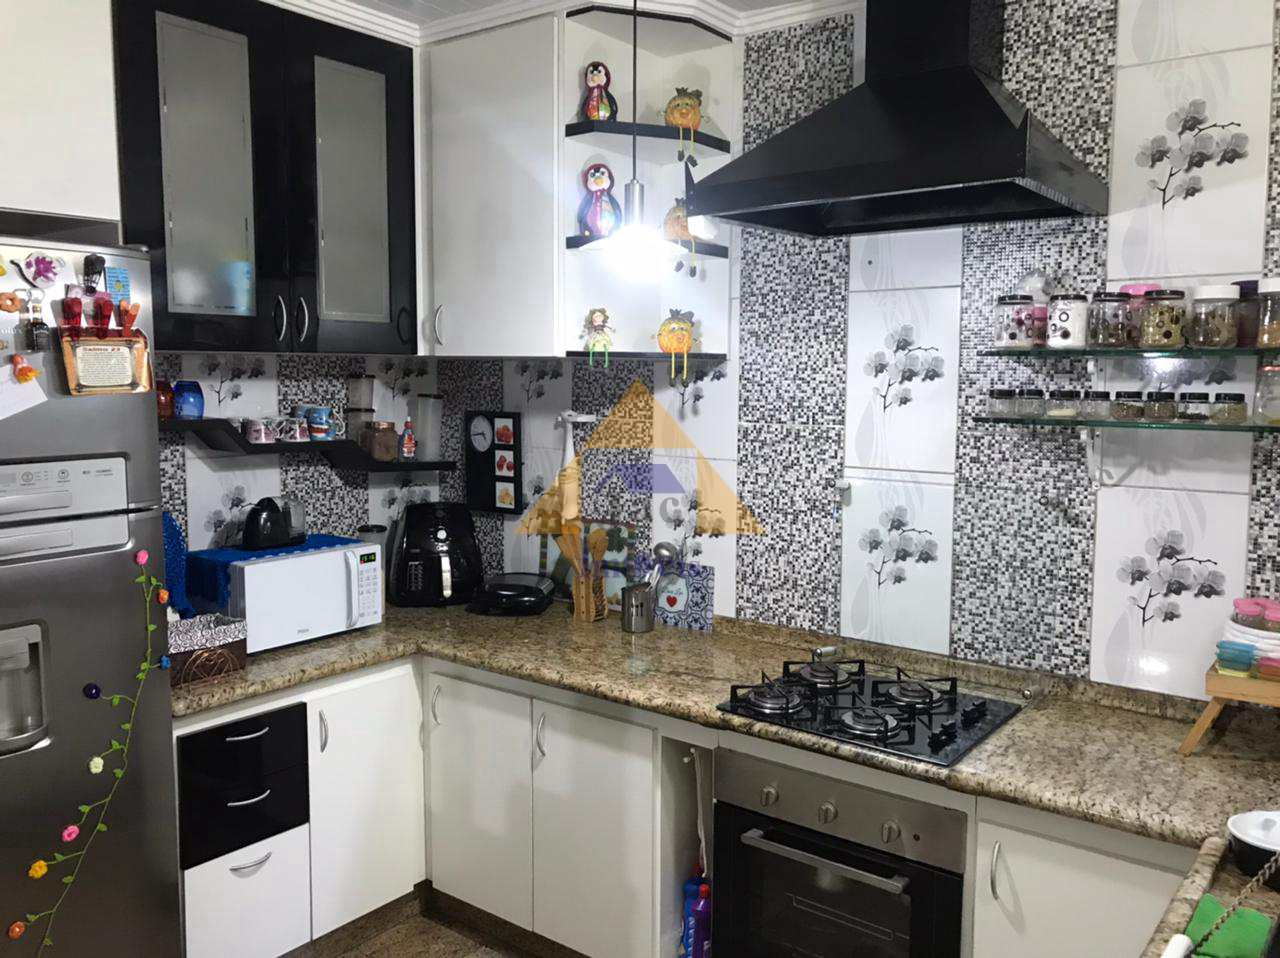 Sobrado com 3 dorms, Vila Pires, Santo André - R$ 450 mil, Cod: 11119